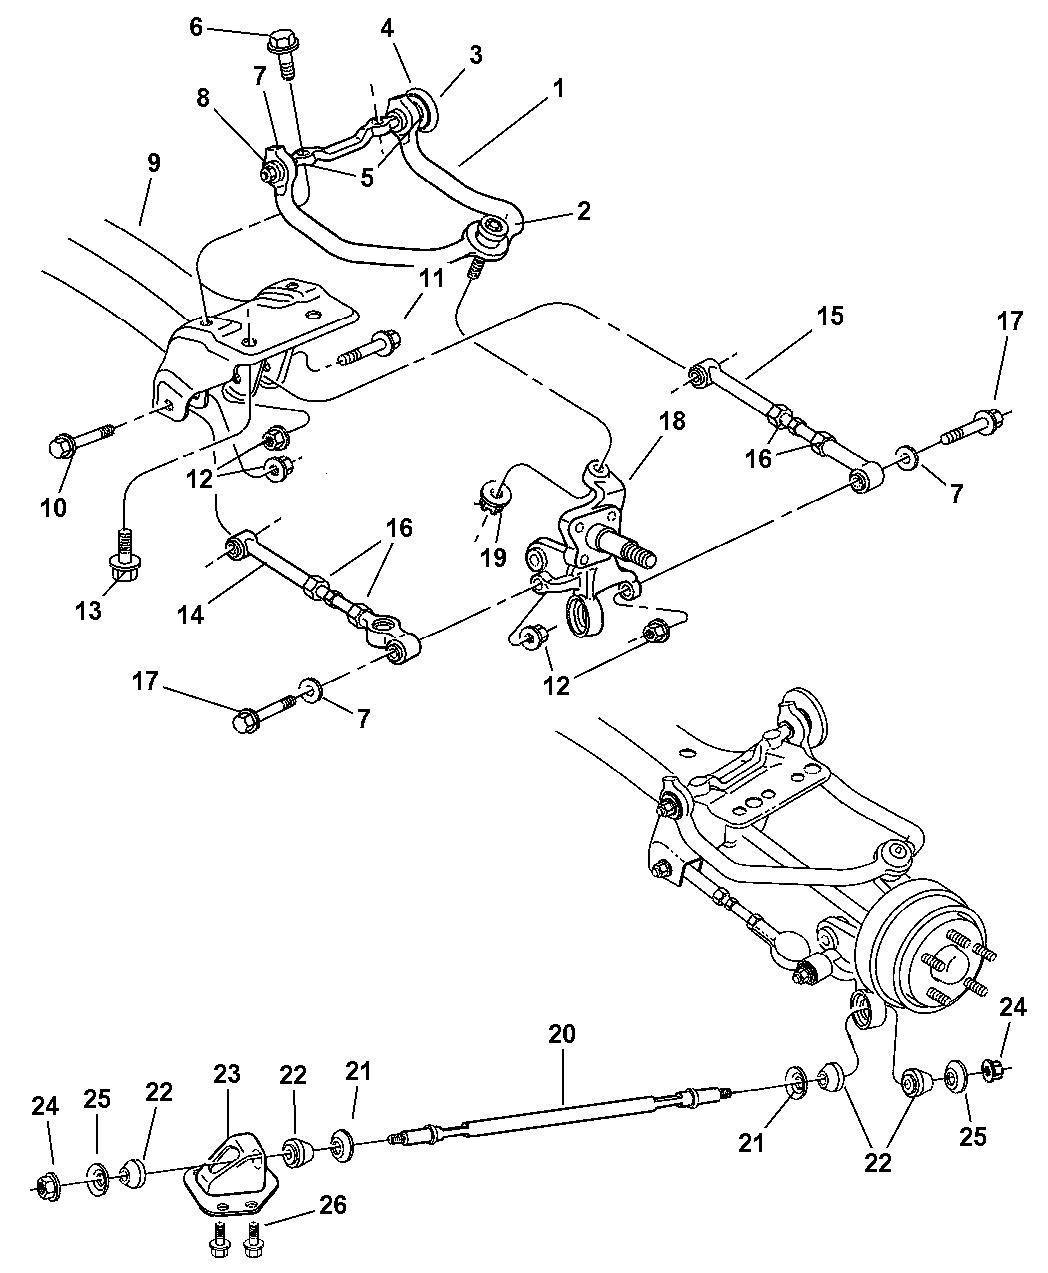 2006 chrysler sebring rear suspension